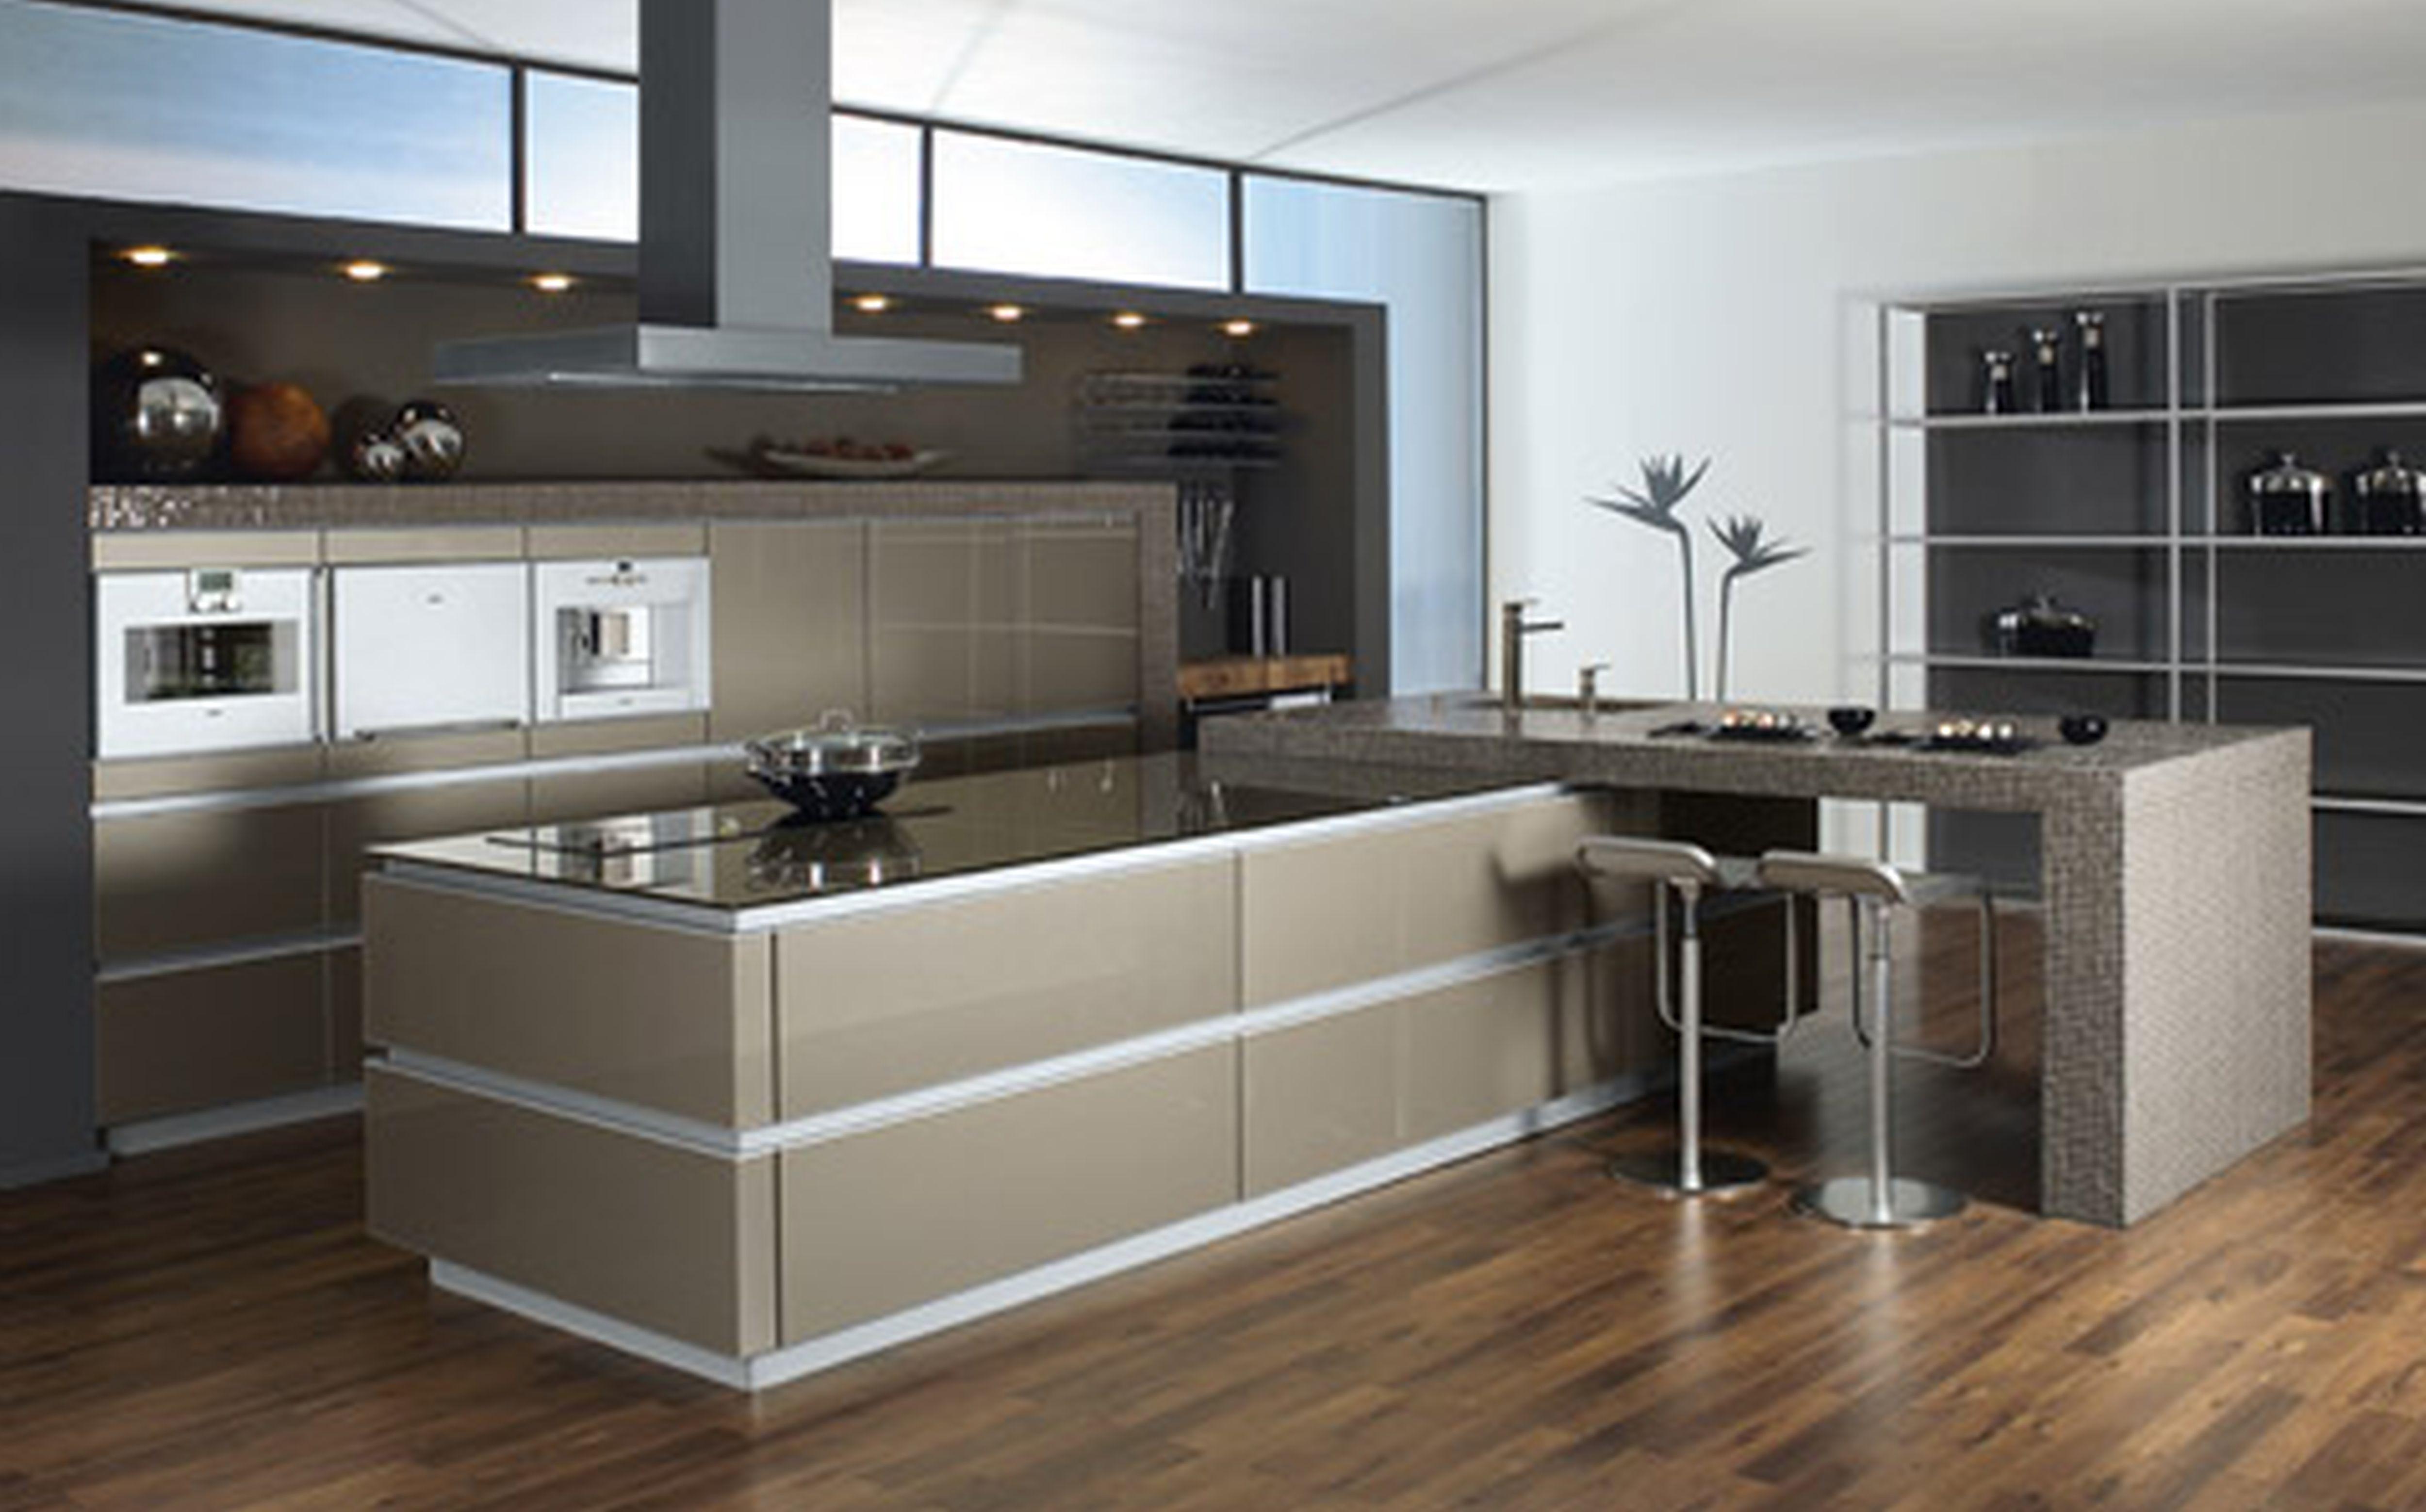 White moen kitchen faucet photo - 3